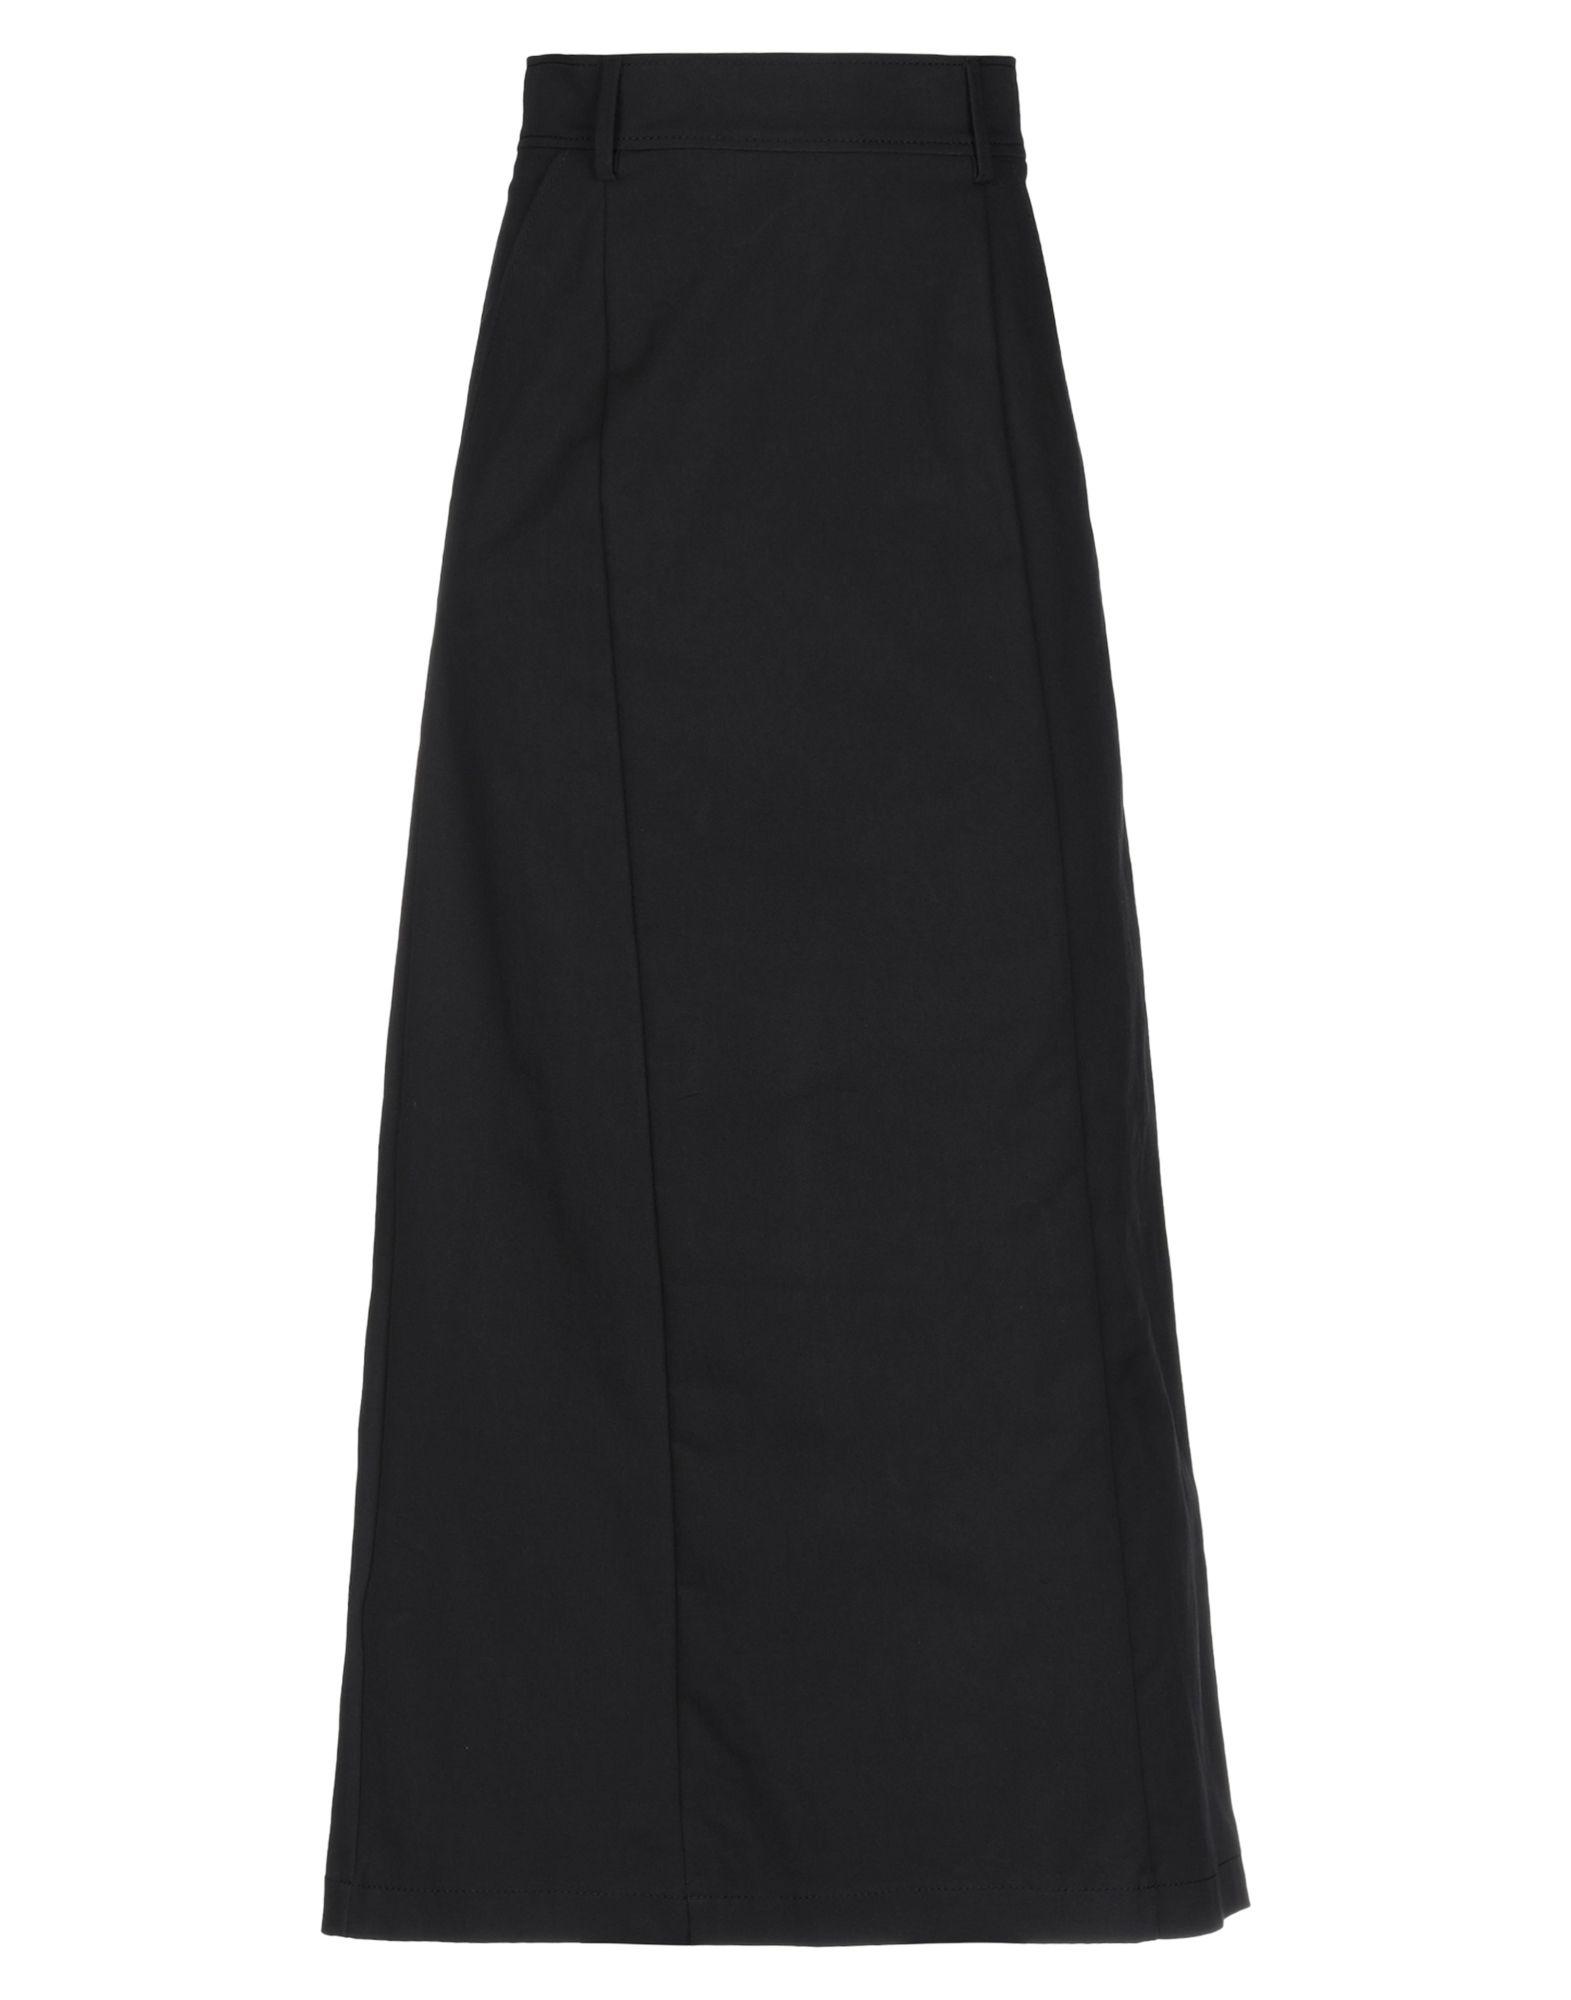 CARLA G. Длинная юбка katia g длинная юбка